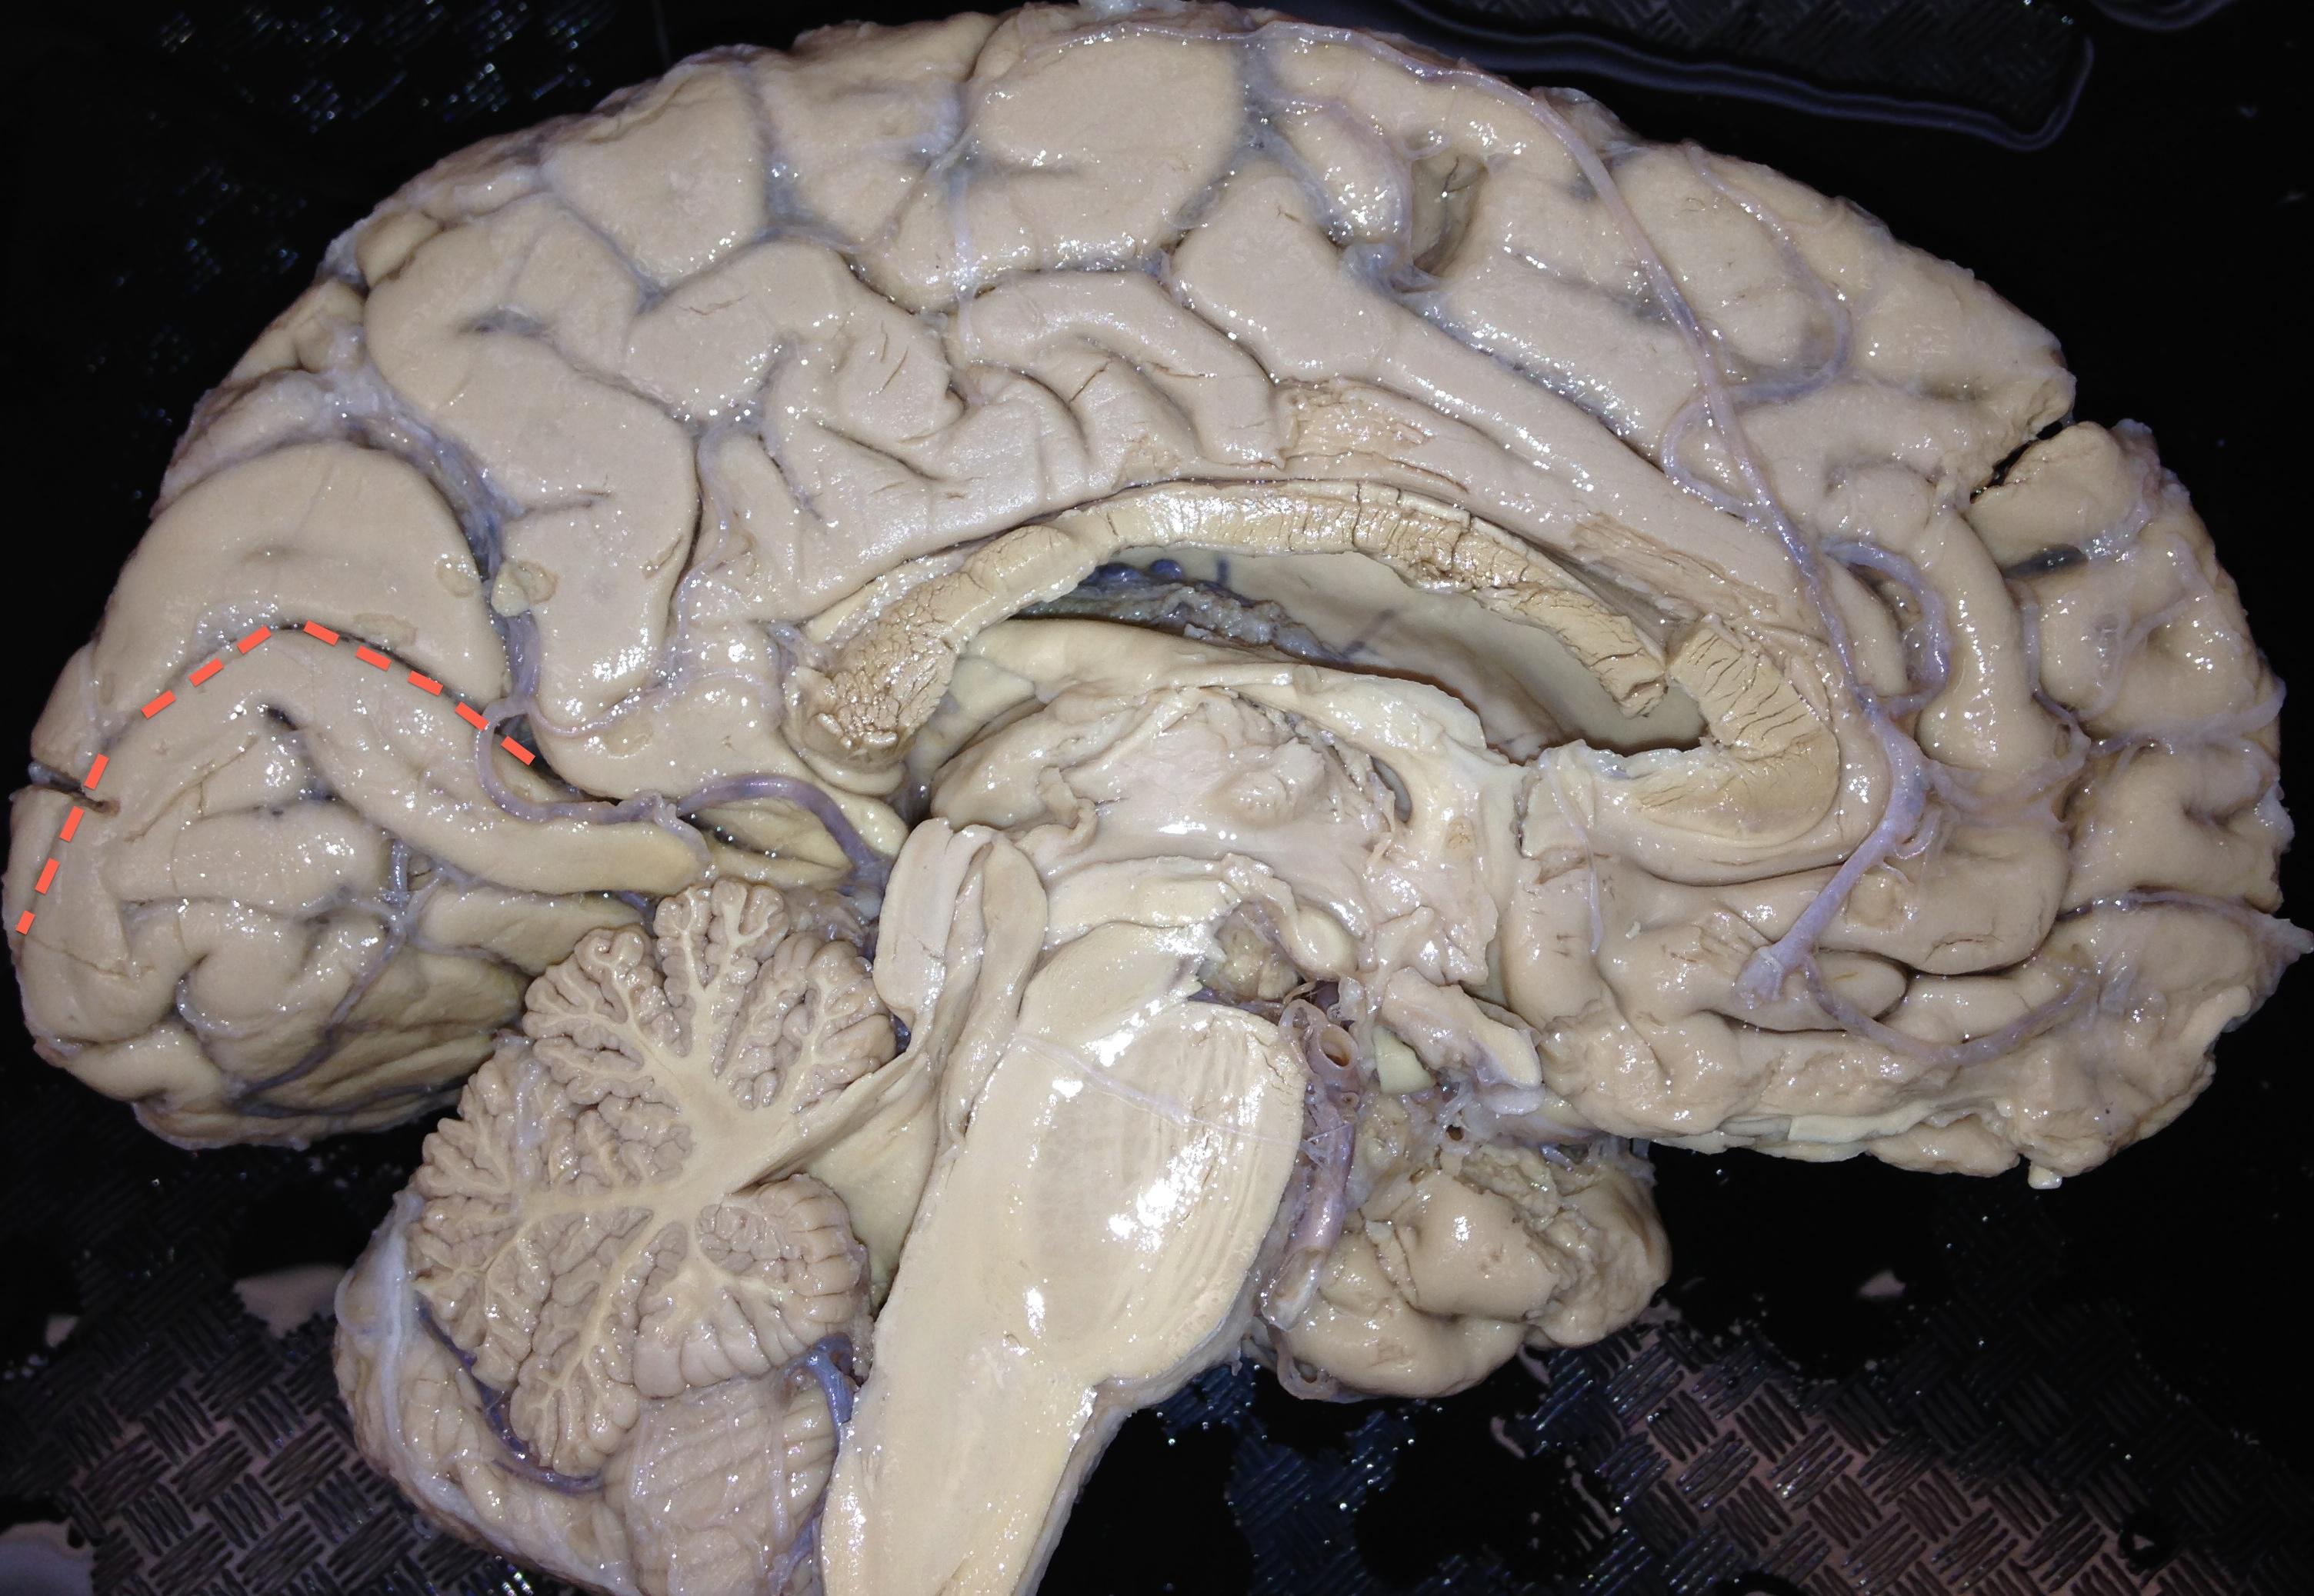 Let\'s go claustrum-hunting – The brain is sooooo cool!